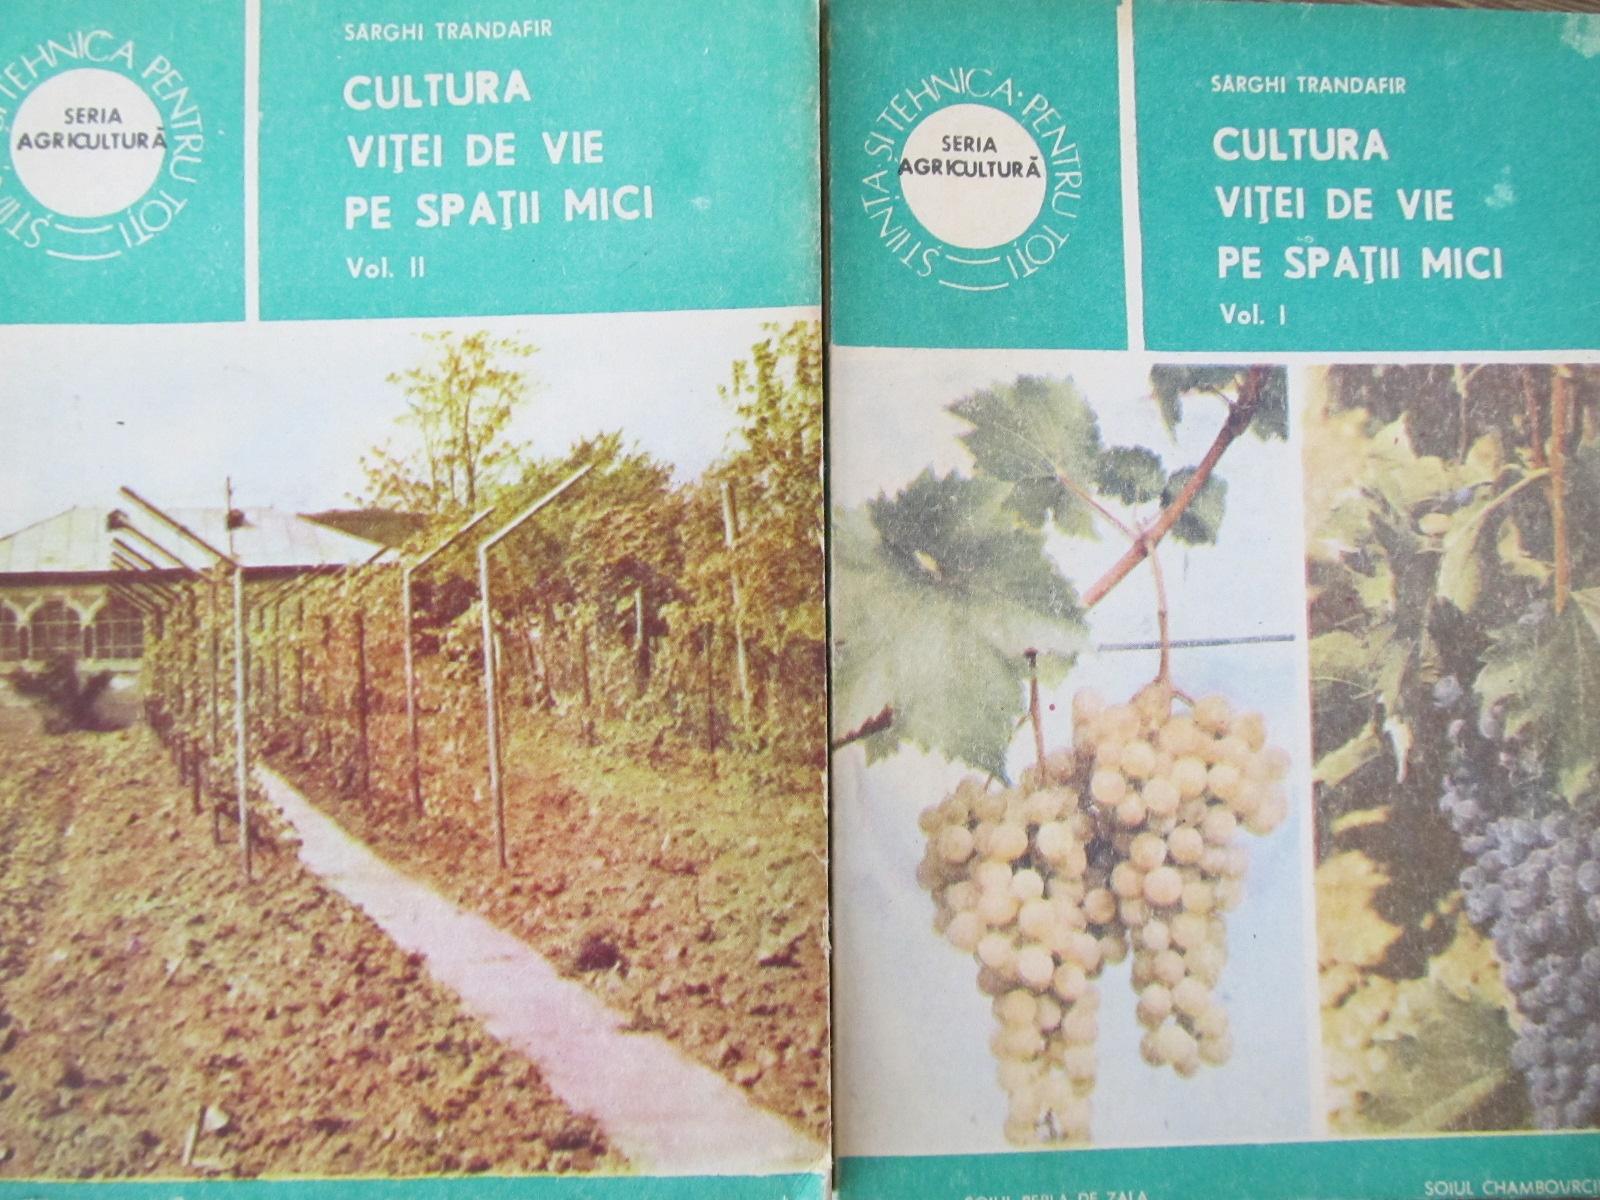 Cultura vitei de vie pe spatii mici (2 vol.) - Sarghi Trandafir | Detalii carte